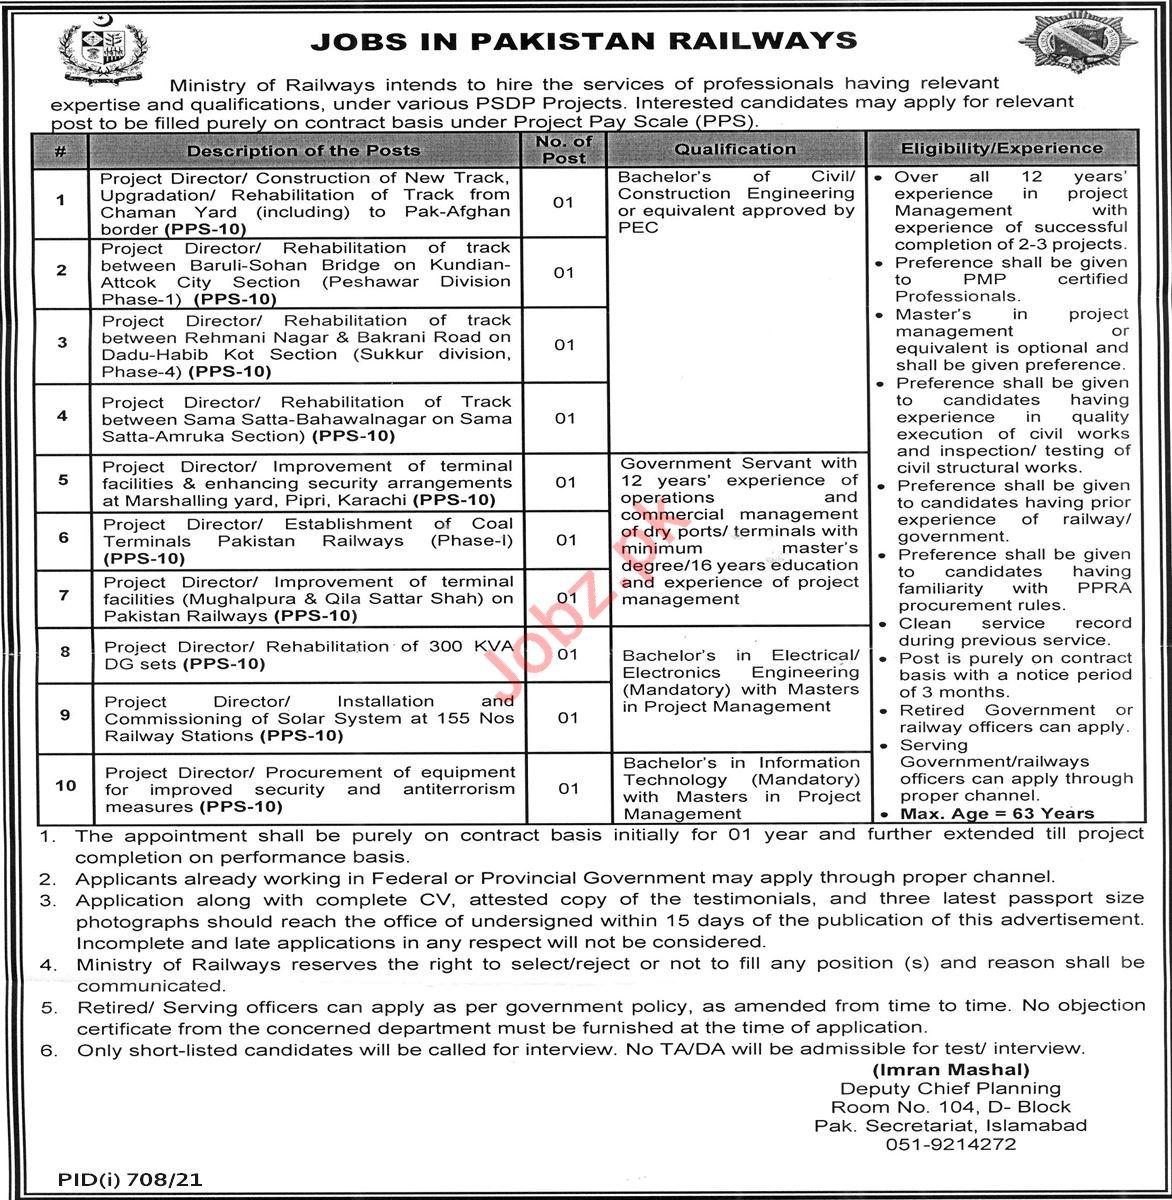 Pakistan Railways Islamabad Jobs 2021 for Project Director